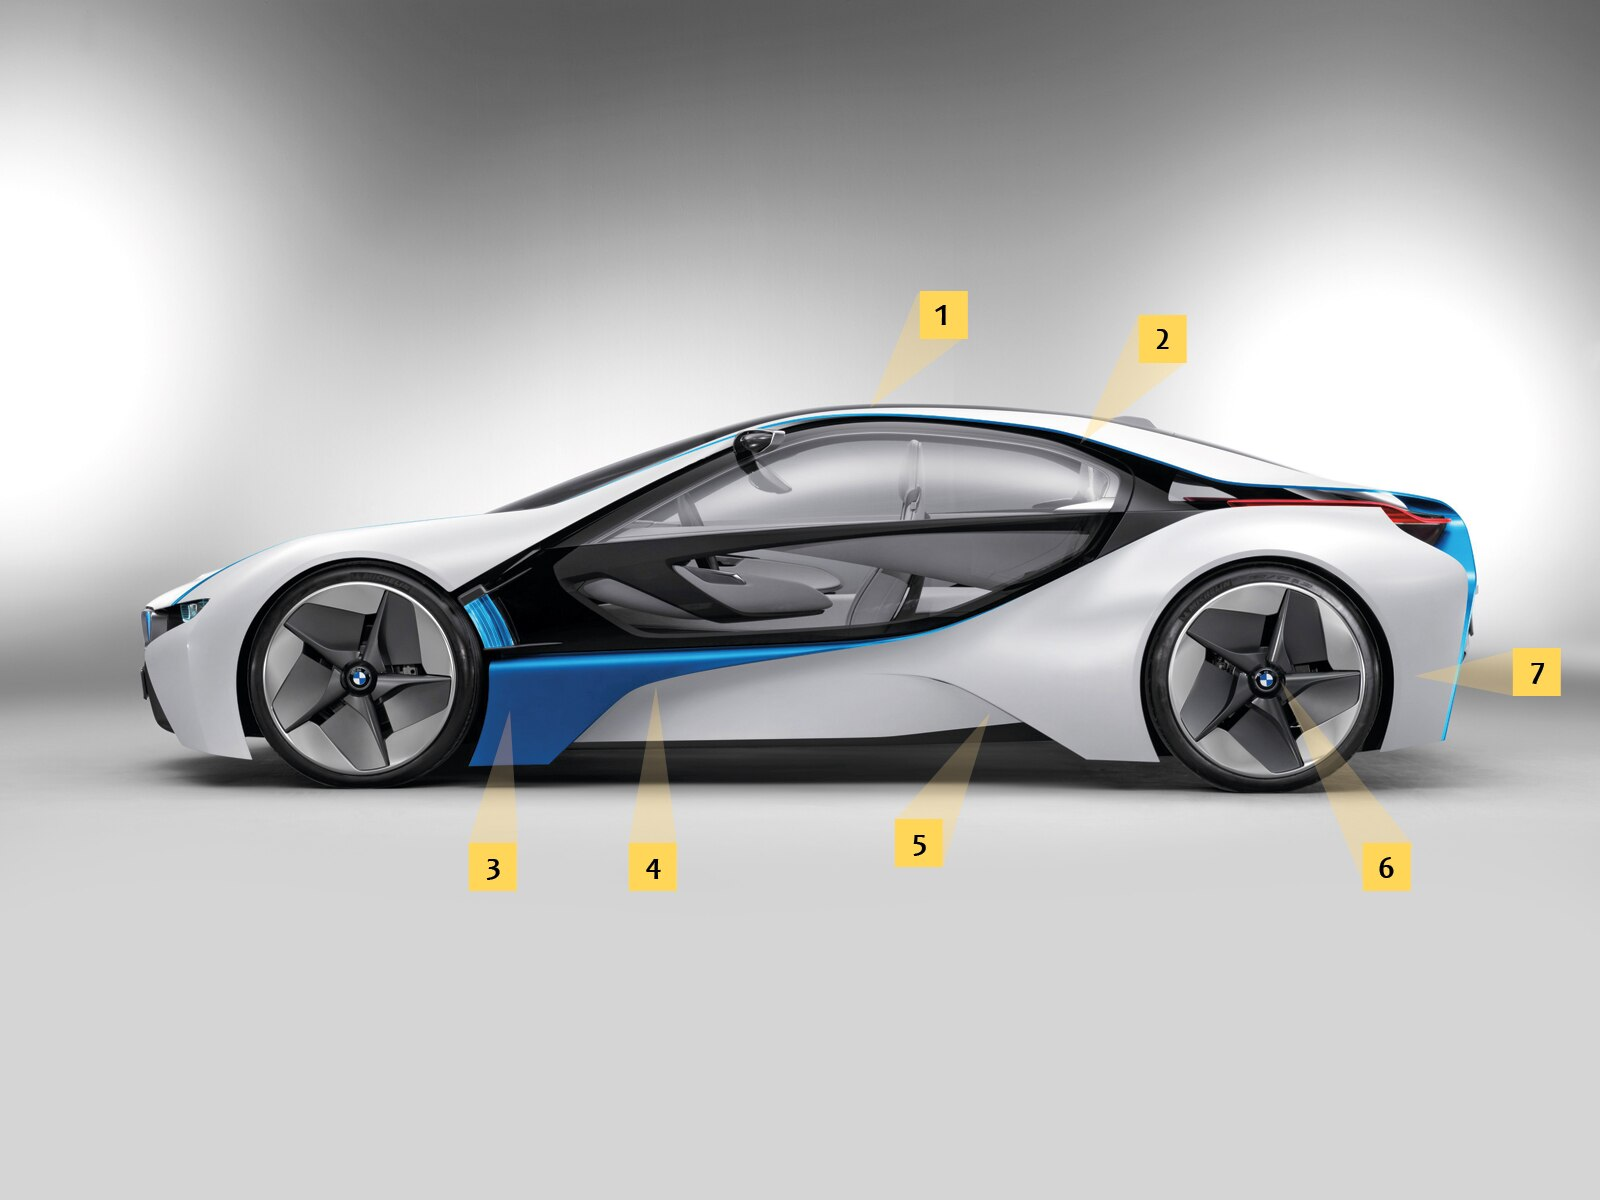 0912 02 Z BMW Vision EfficientDynamics Side View